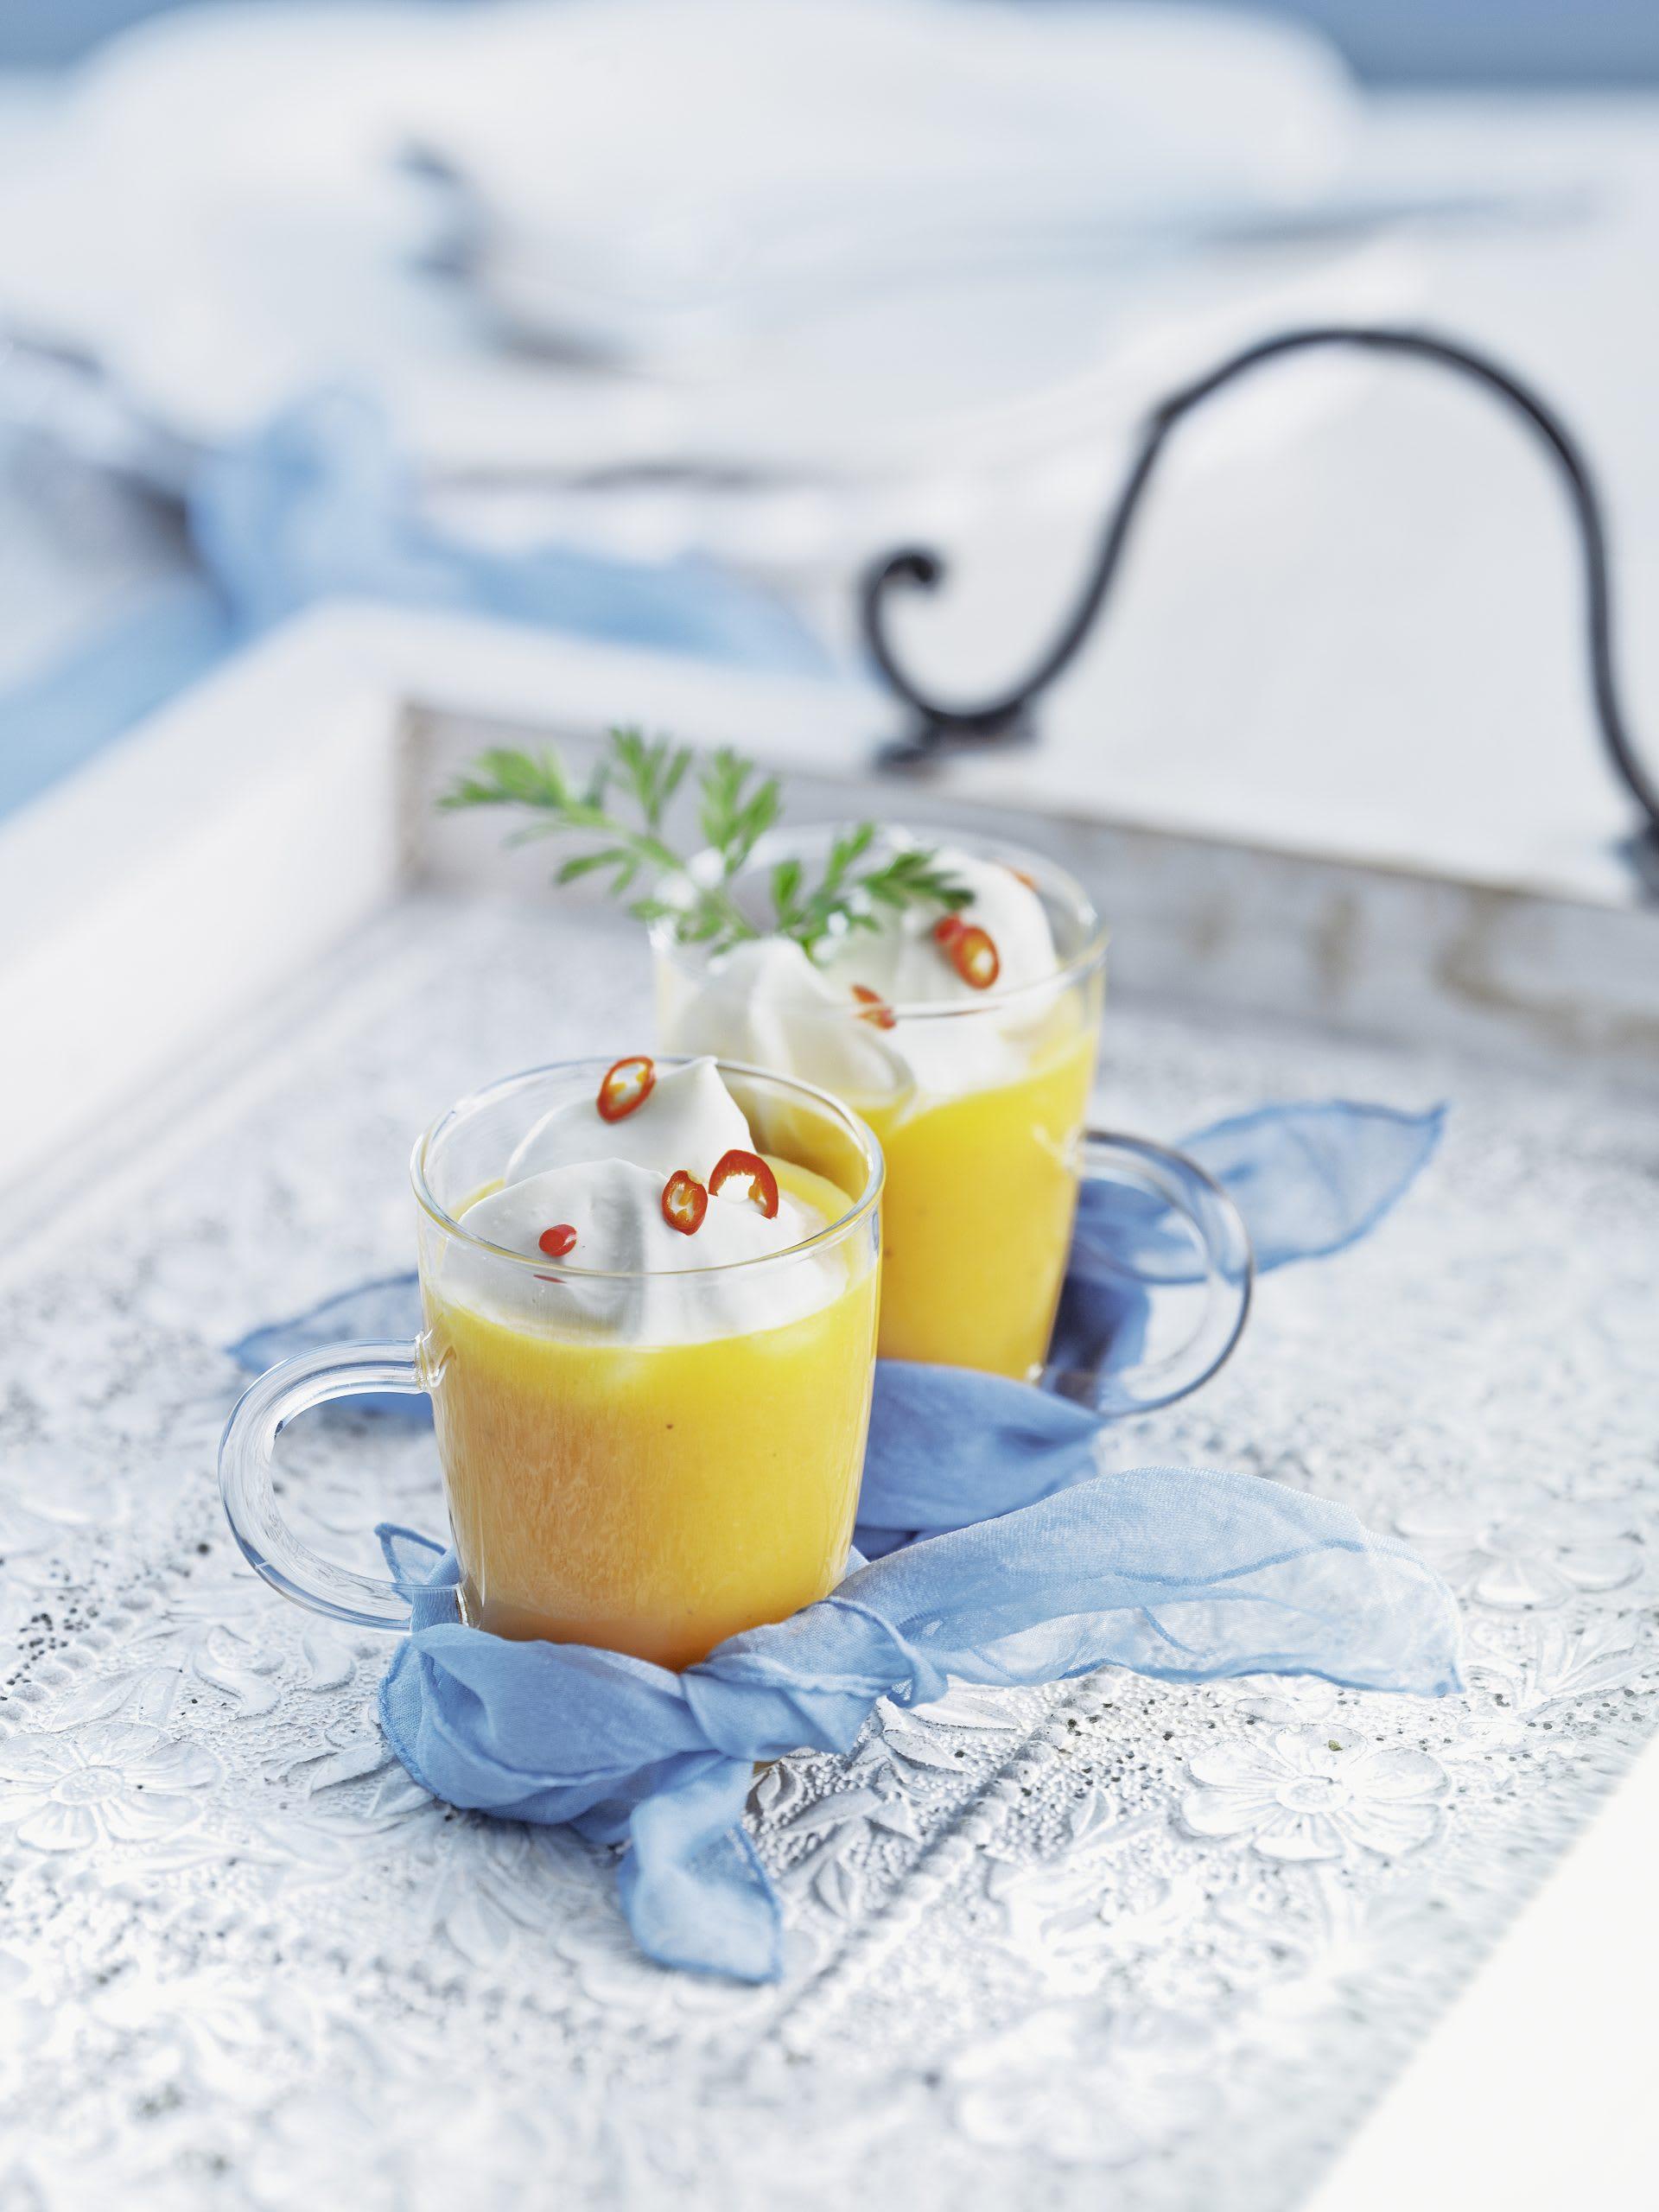 Cappuccino aux carottes